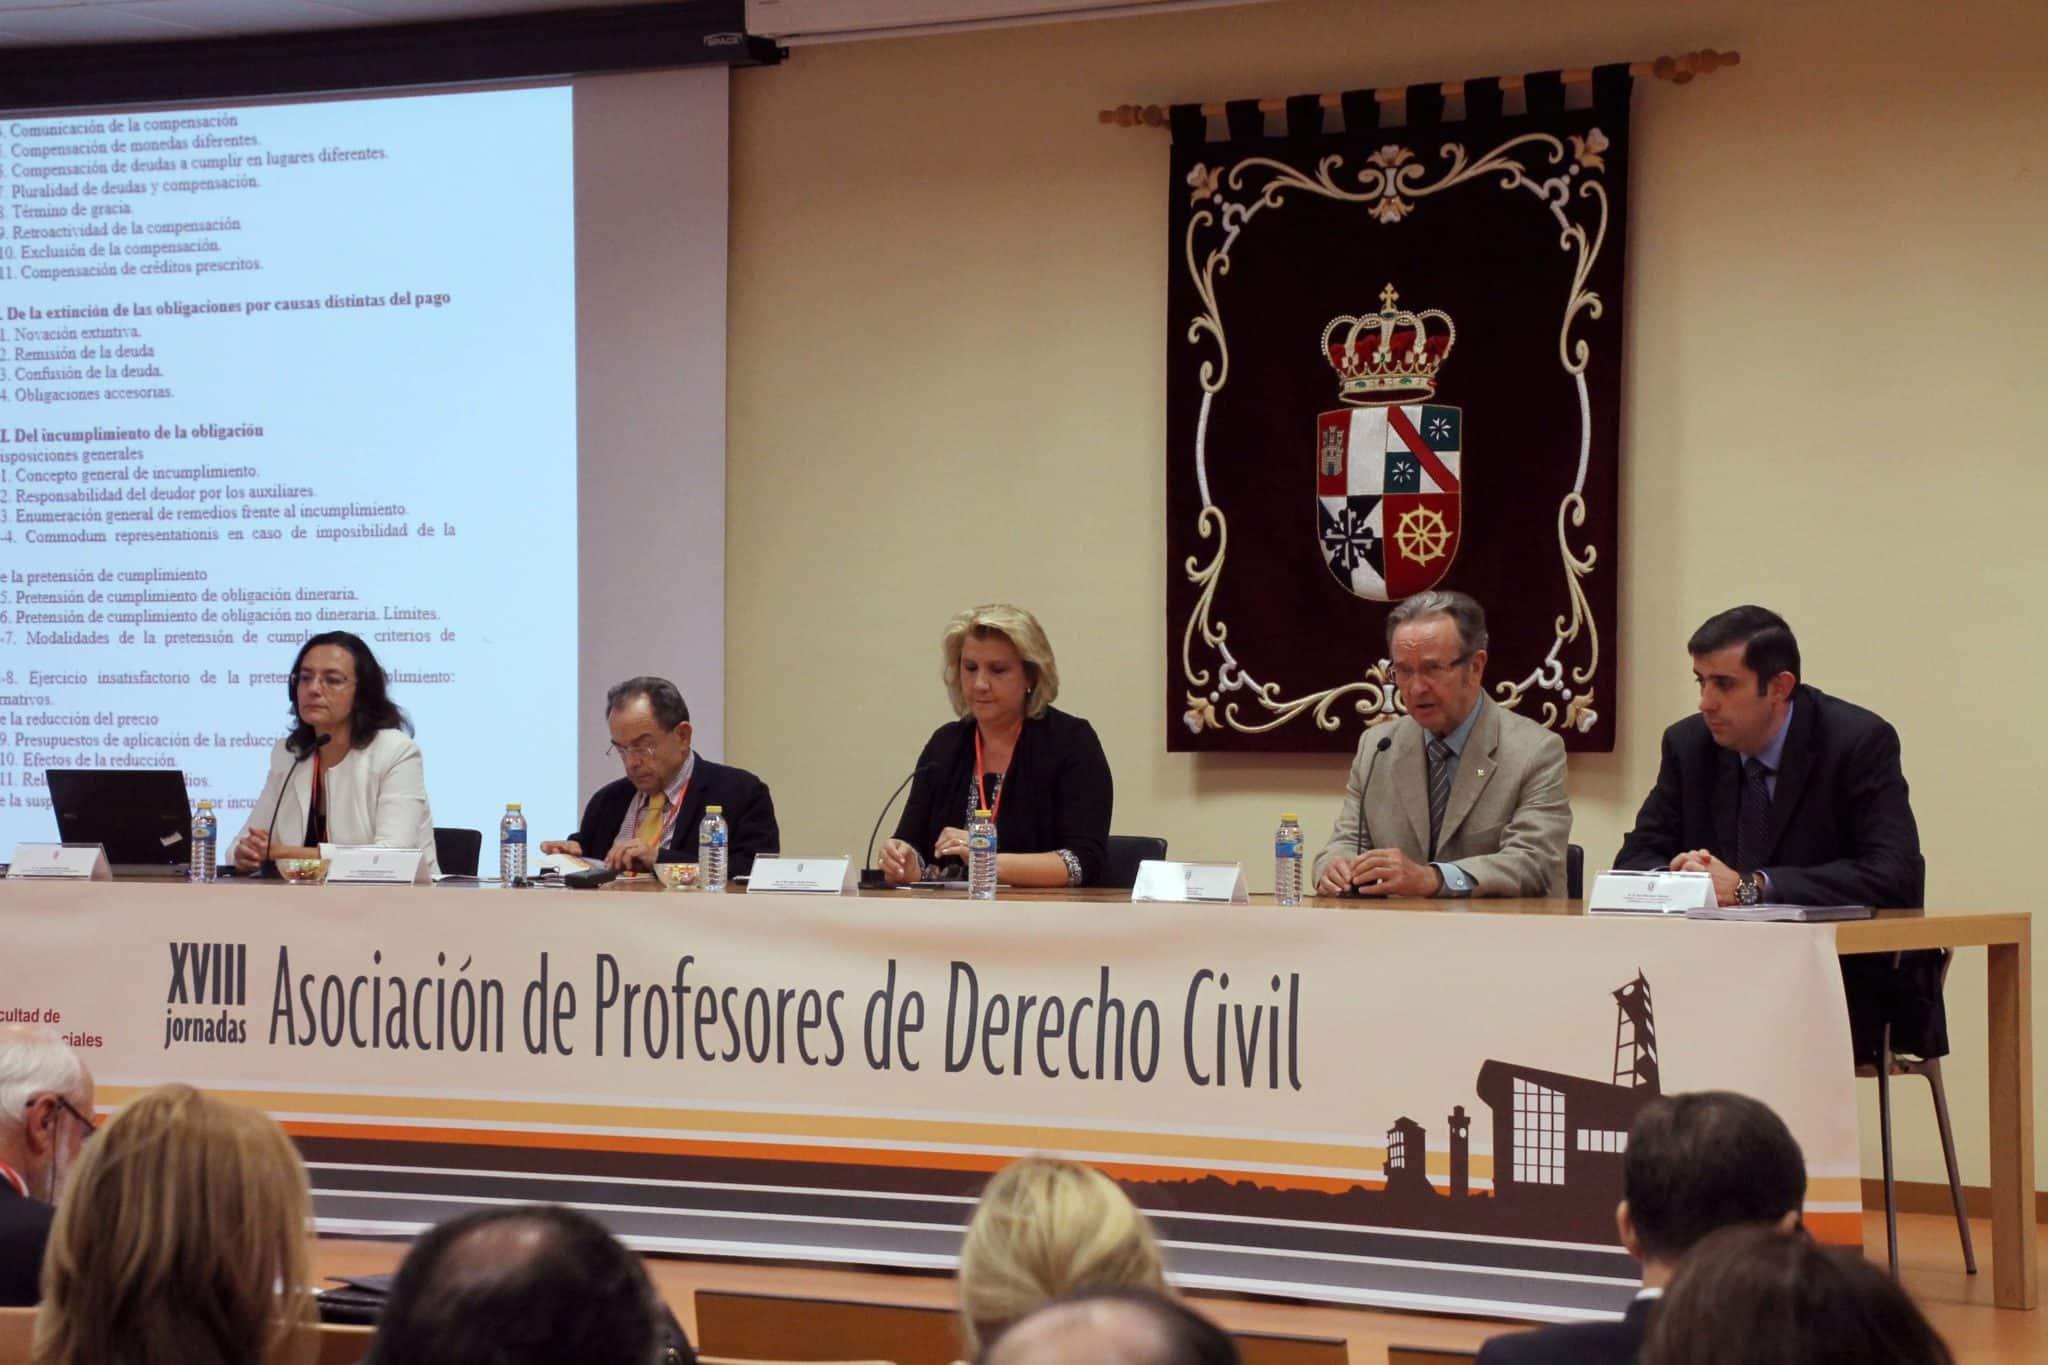 https://blog.globalcaja.es/wp-content/uploads/2015/10/APDC-UCLM_Inauguracion-Jornadas-9_R.jpg